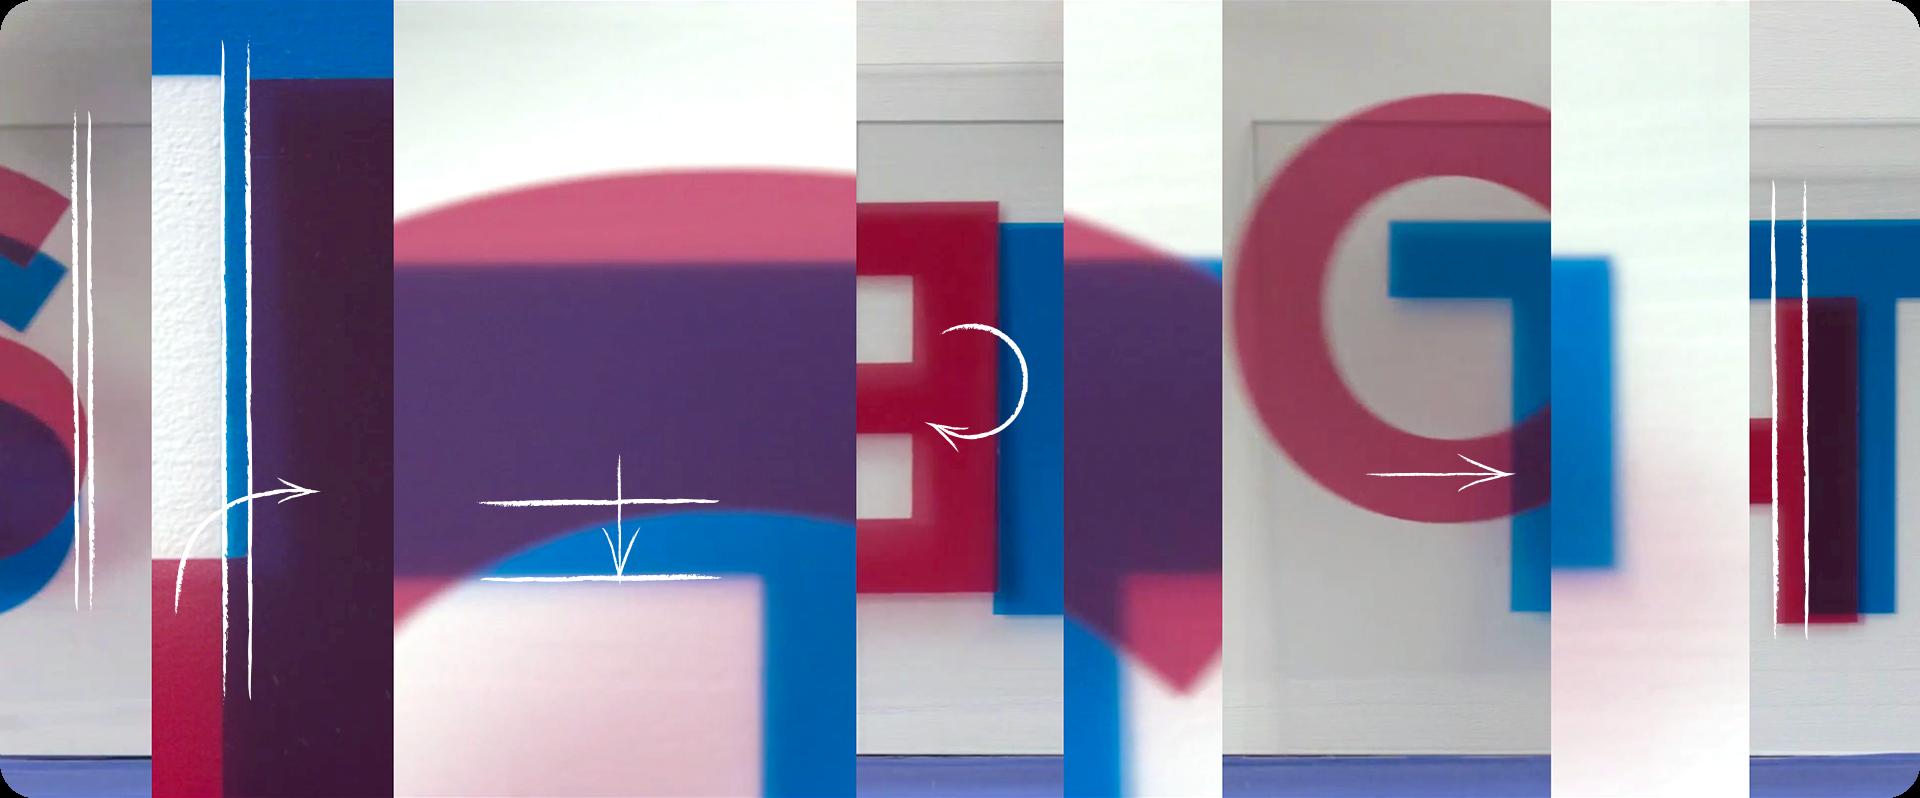 Netflix Abstract The Art Of Design Episode 3